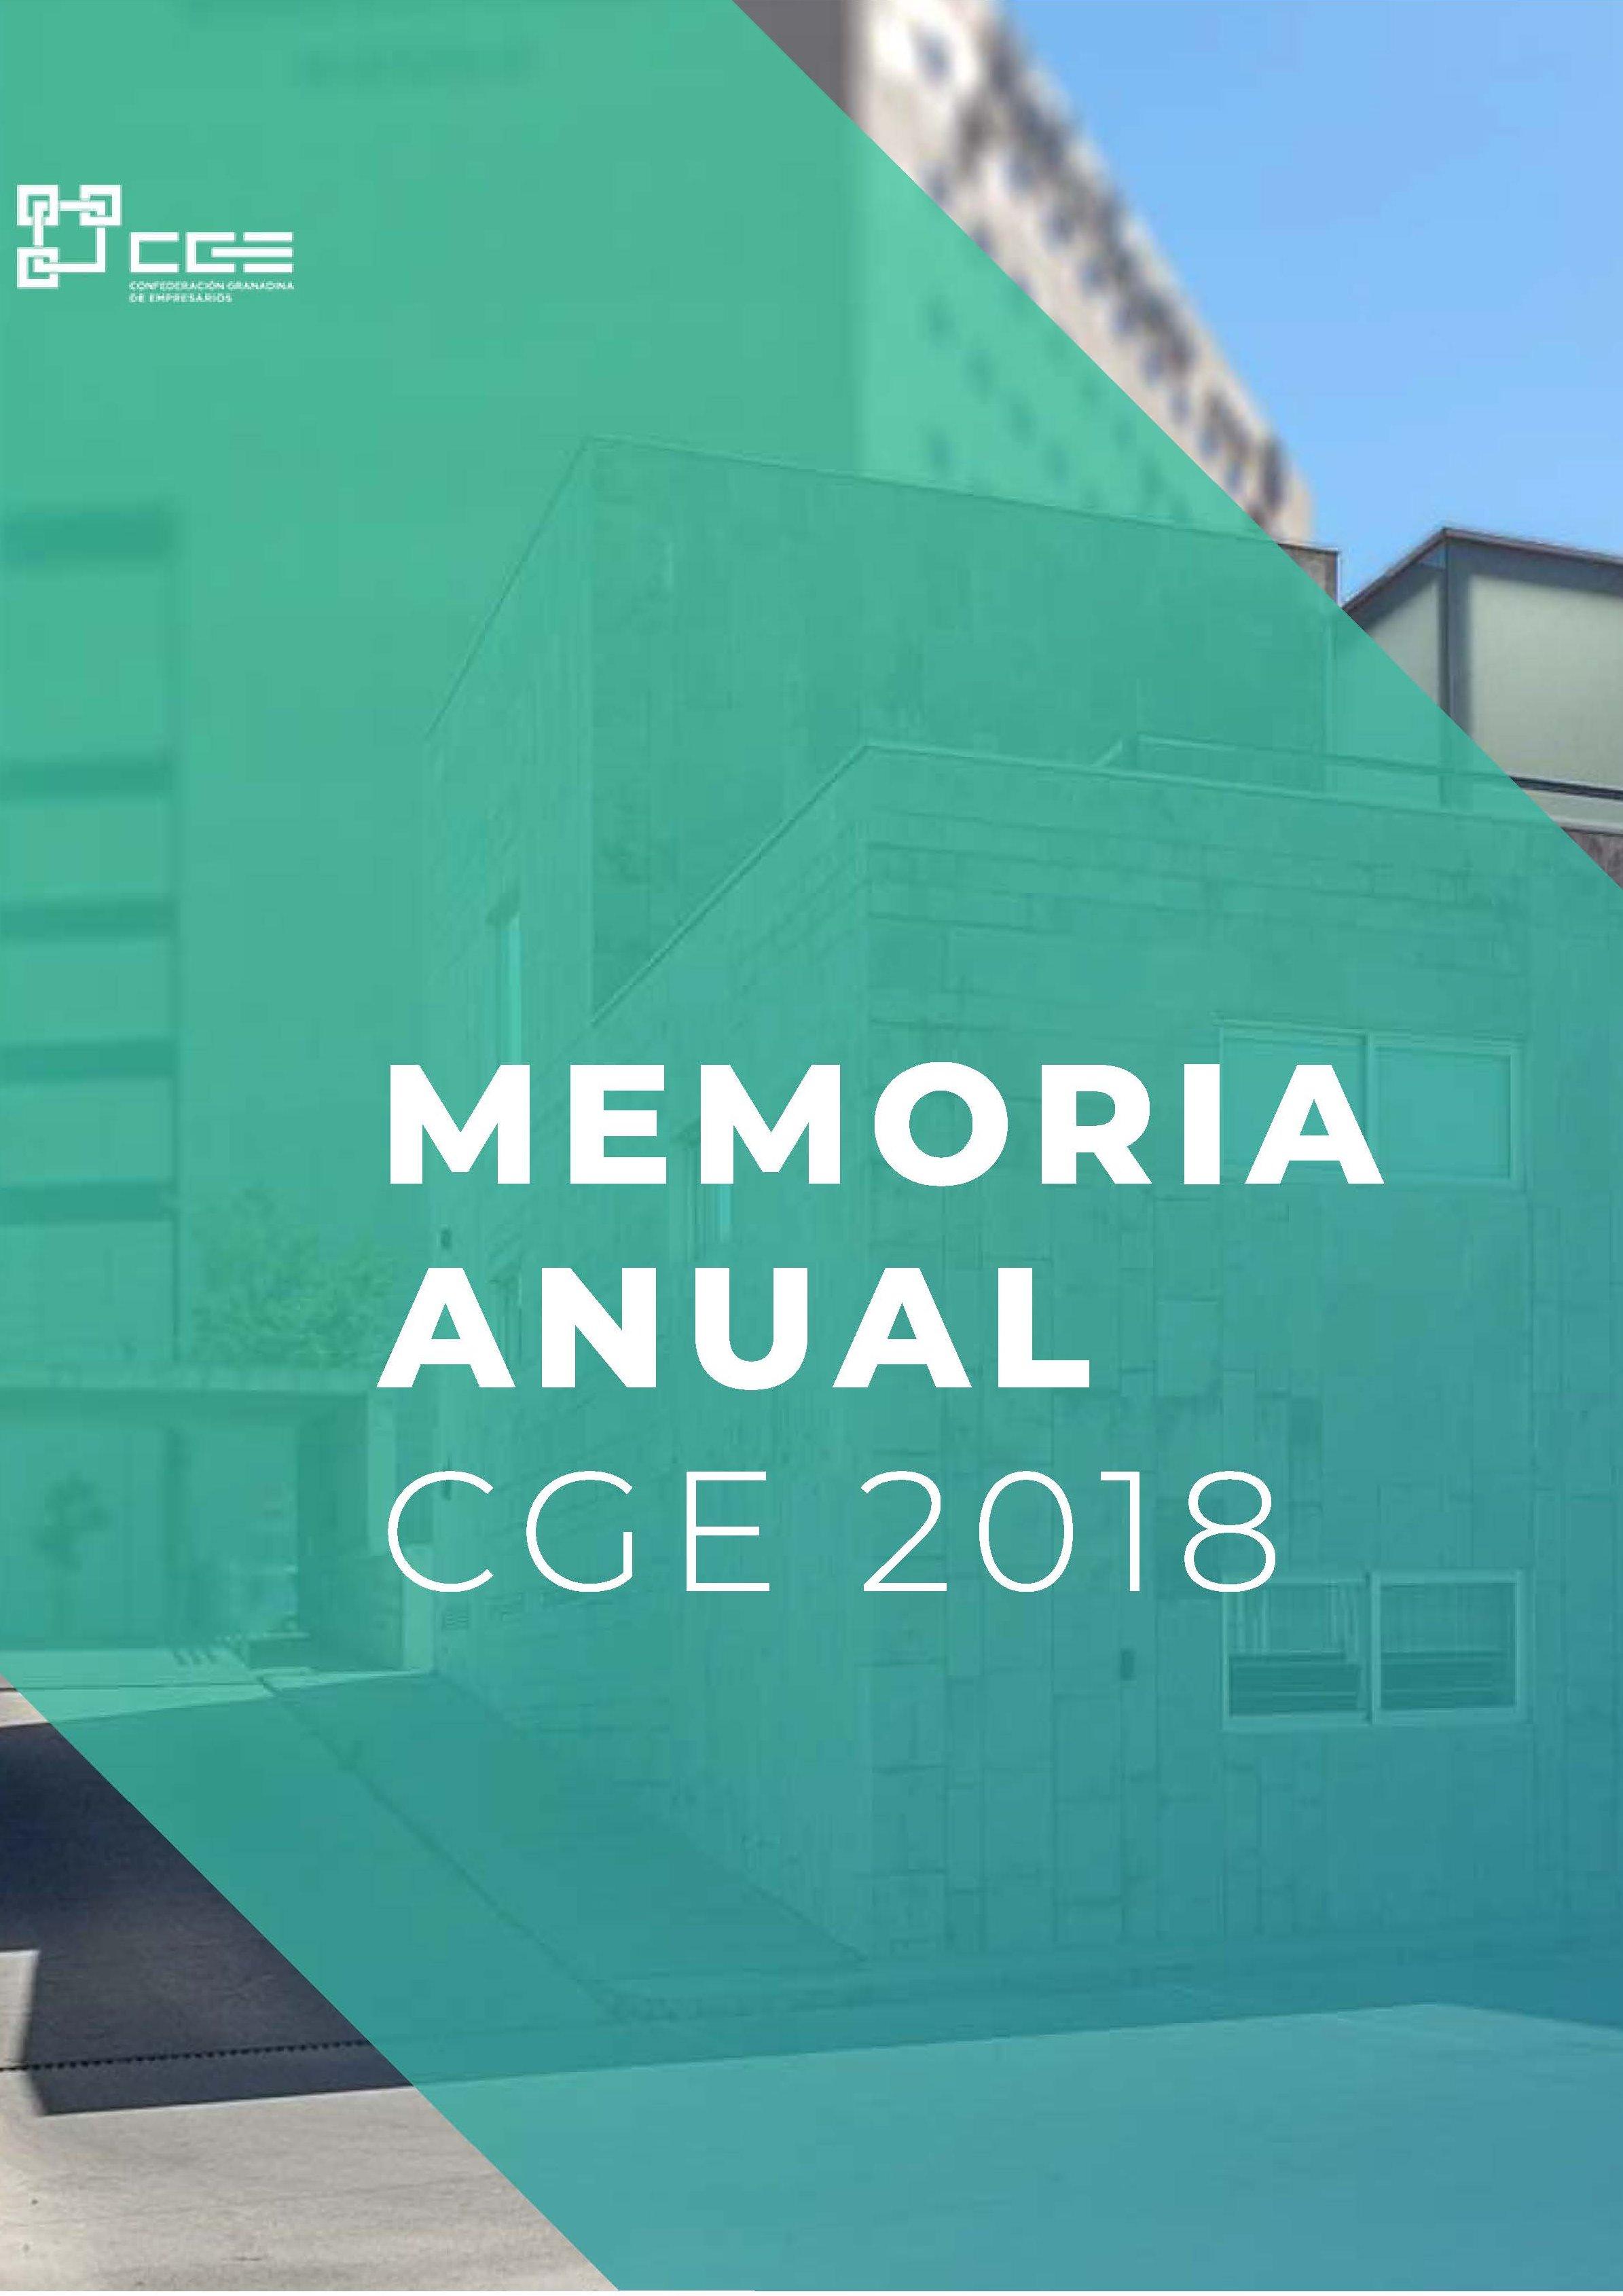 Memoria de actividades CGE 2018